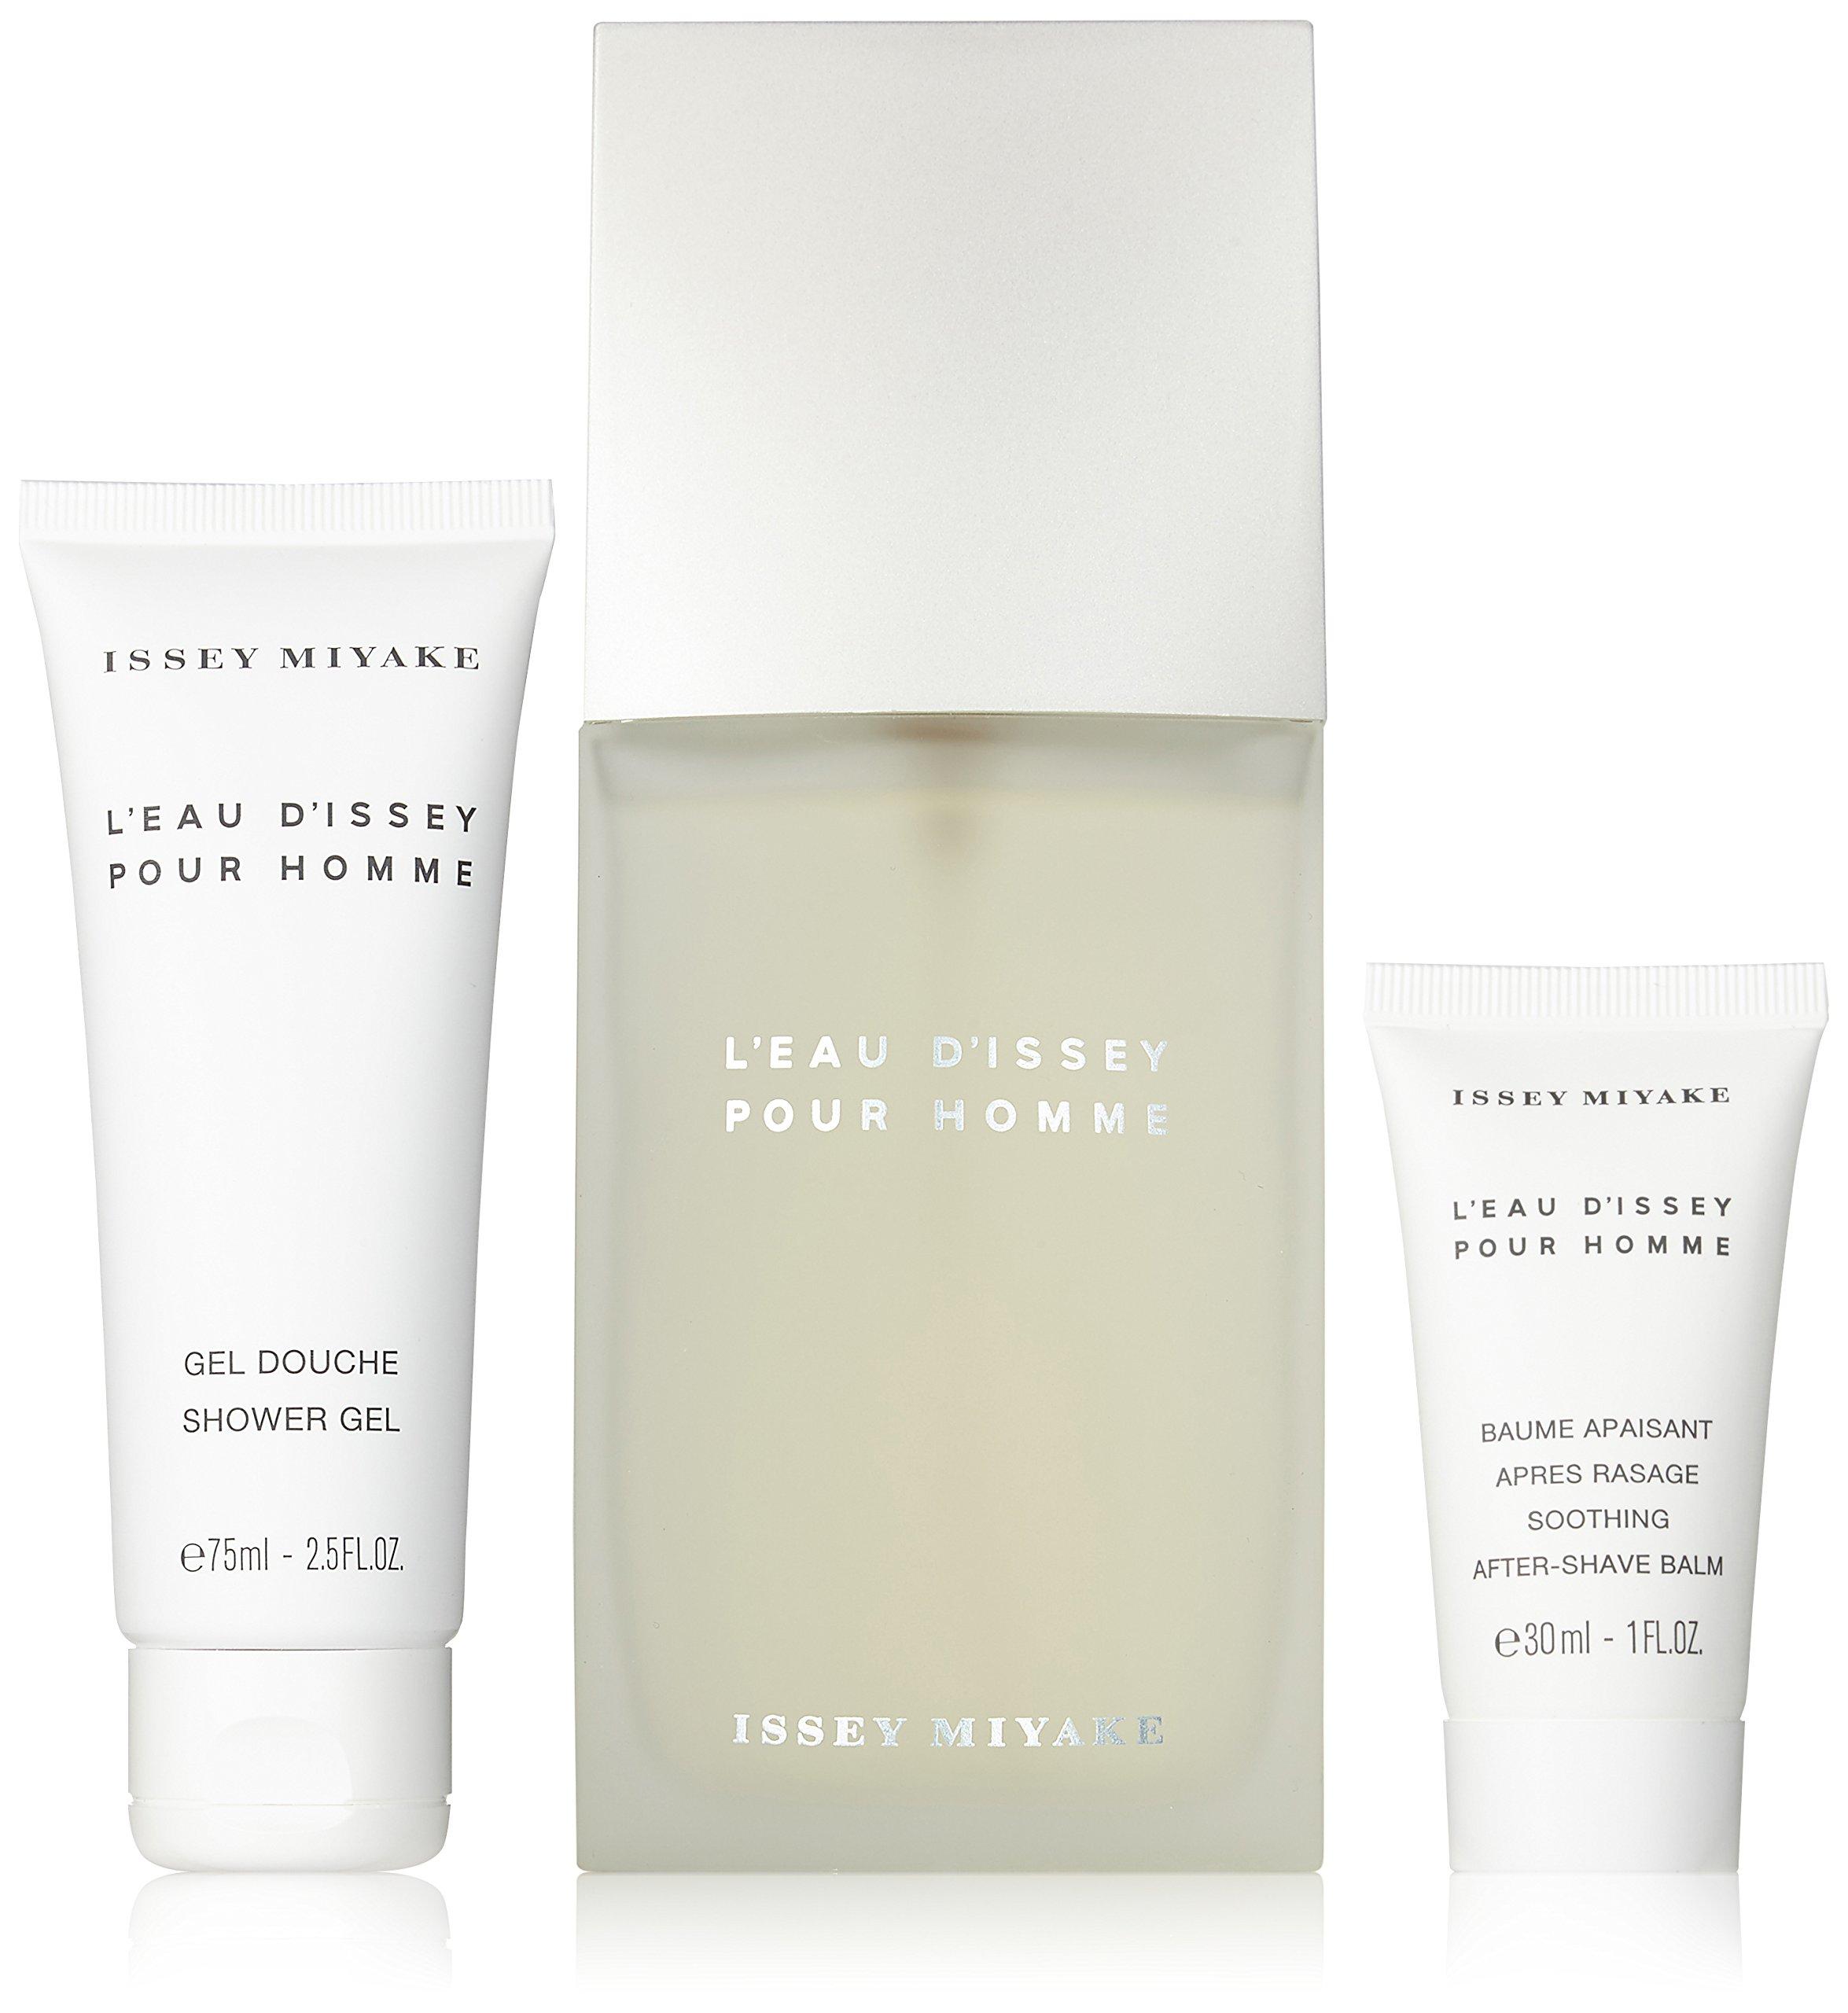 L'Eau D'Issey By Issey Miyake Gift Set For Men Edt Spray 4.2 Oz & Shower Gel 2.5 Oz & Aftershave Balm 1 Oz